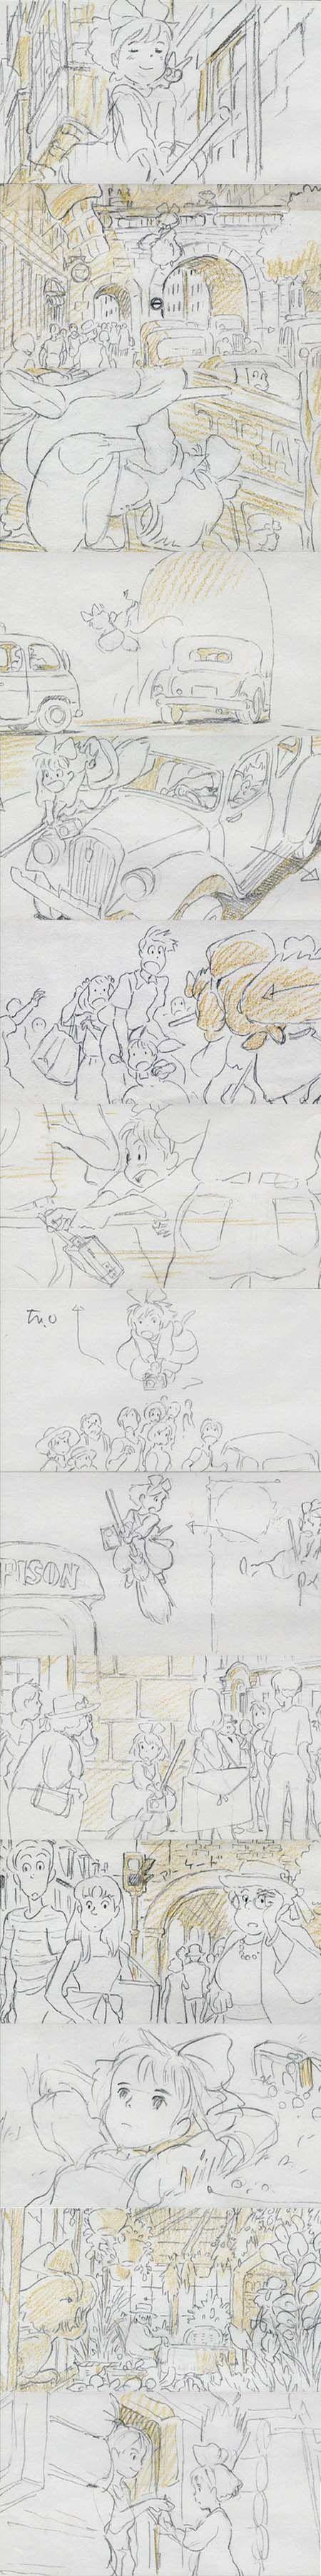 Kiki's Delivery Service storyboard!                                                                                                                                                                                 More